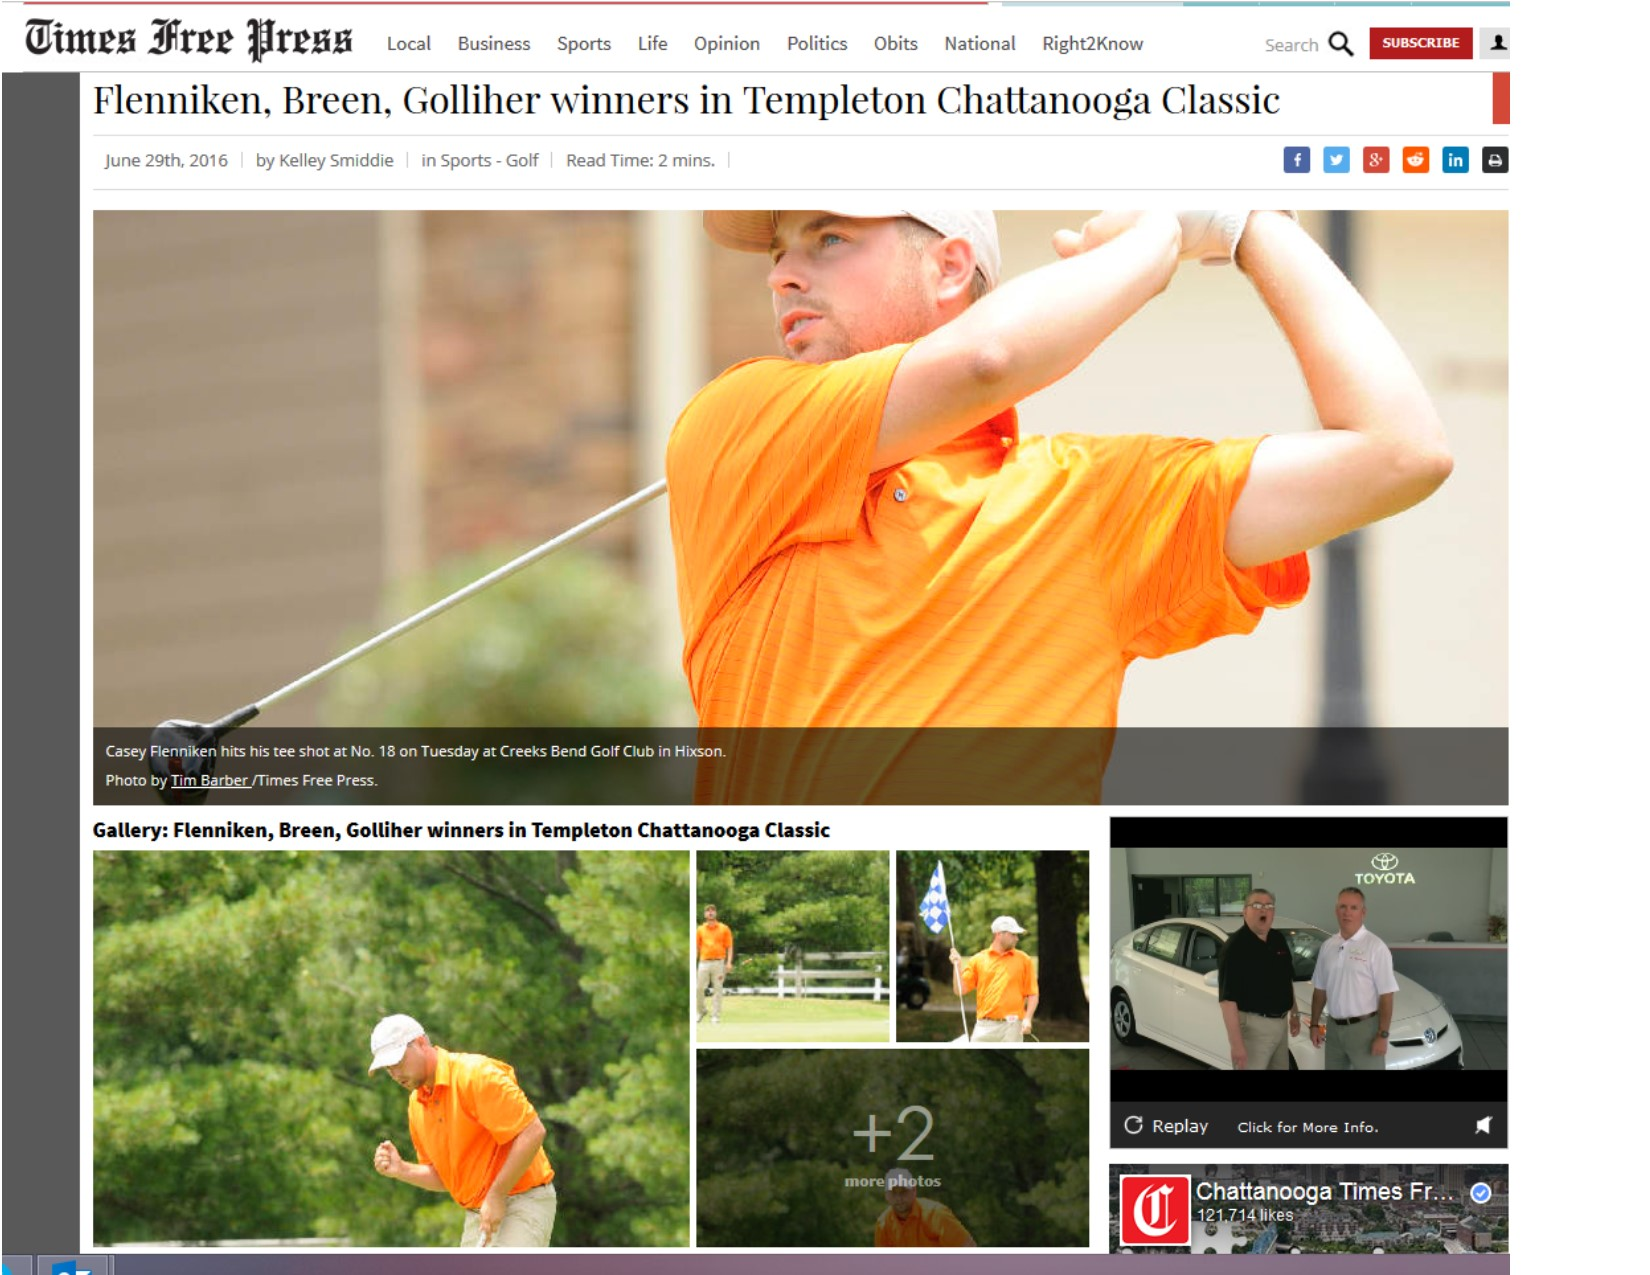 Flenniken, Breen, Golliher winners in Templeton Chattanooga Classic